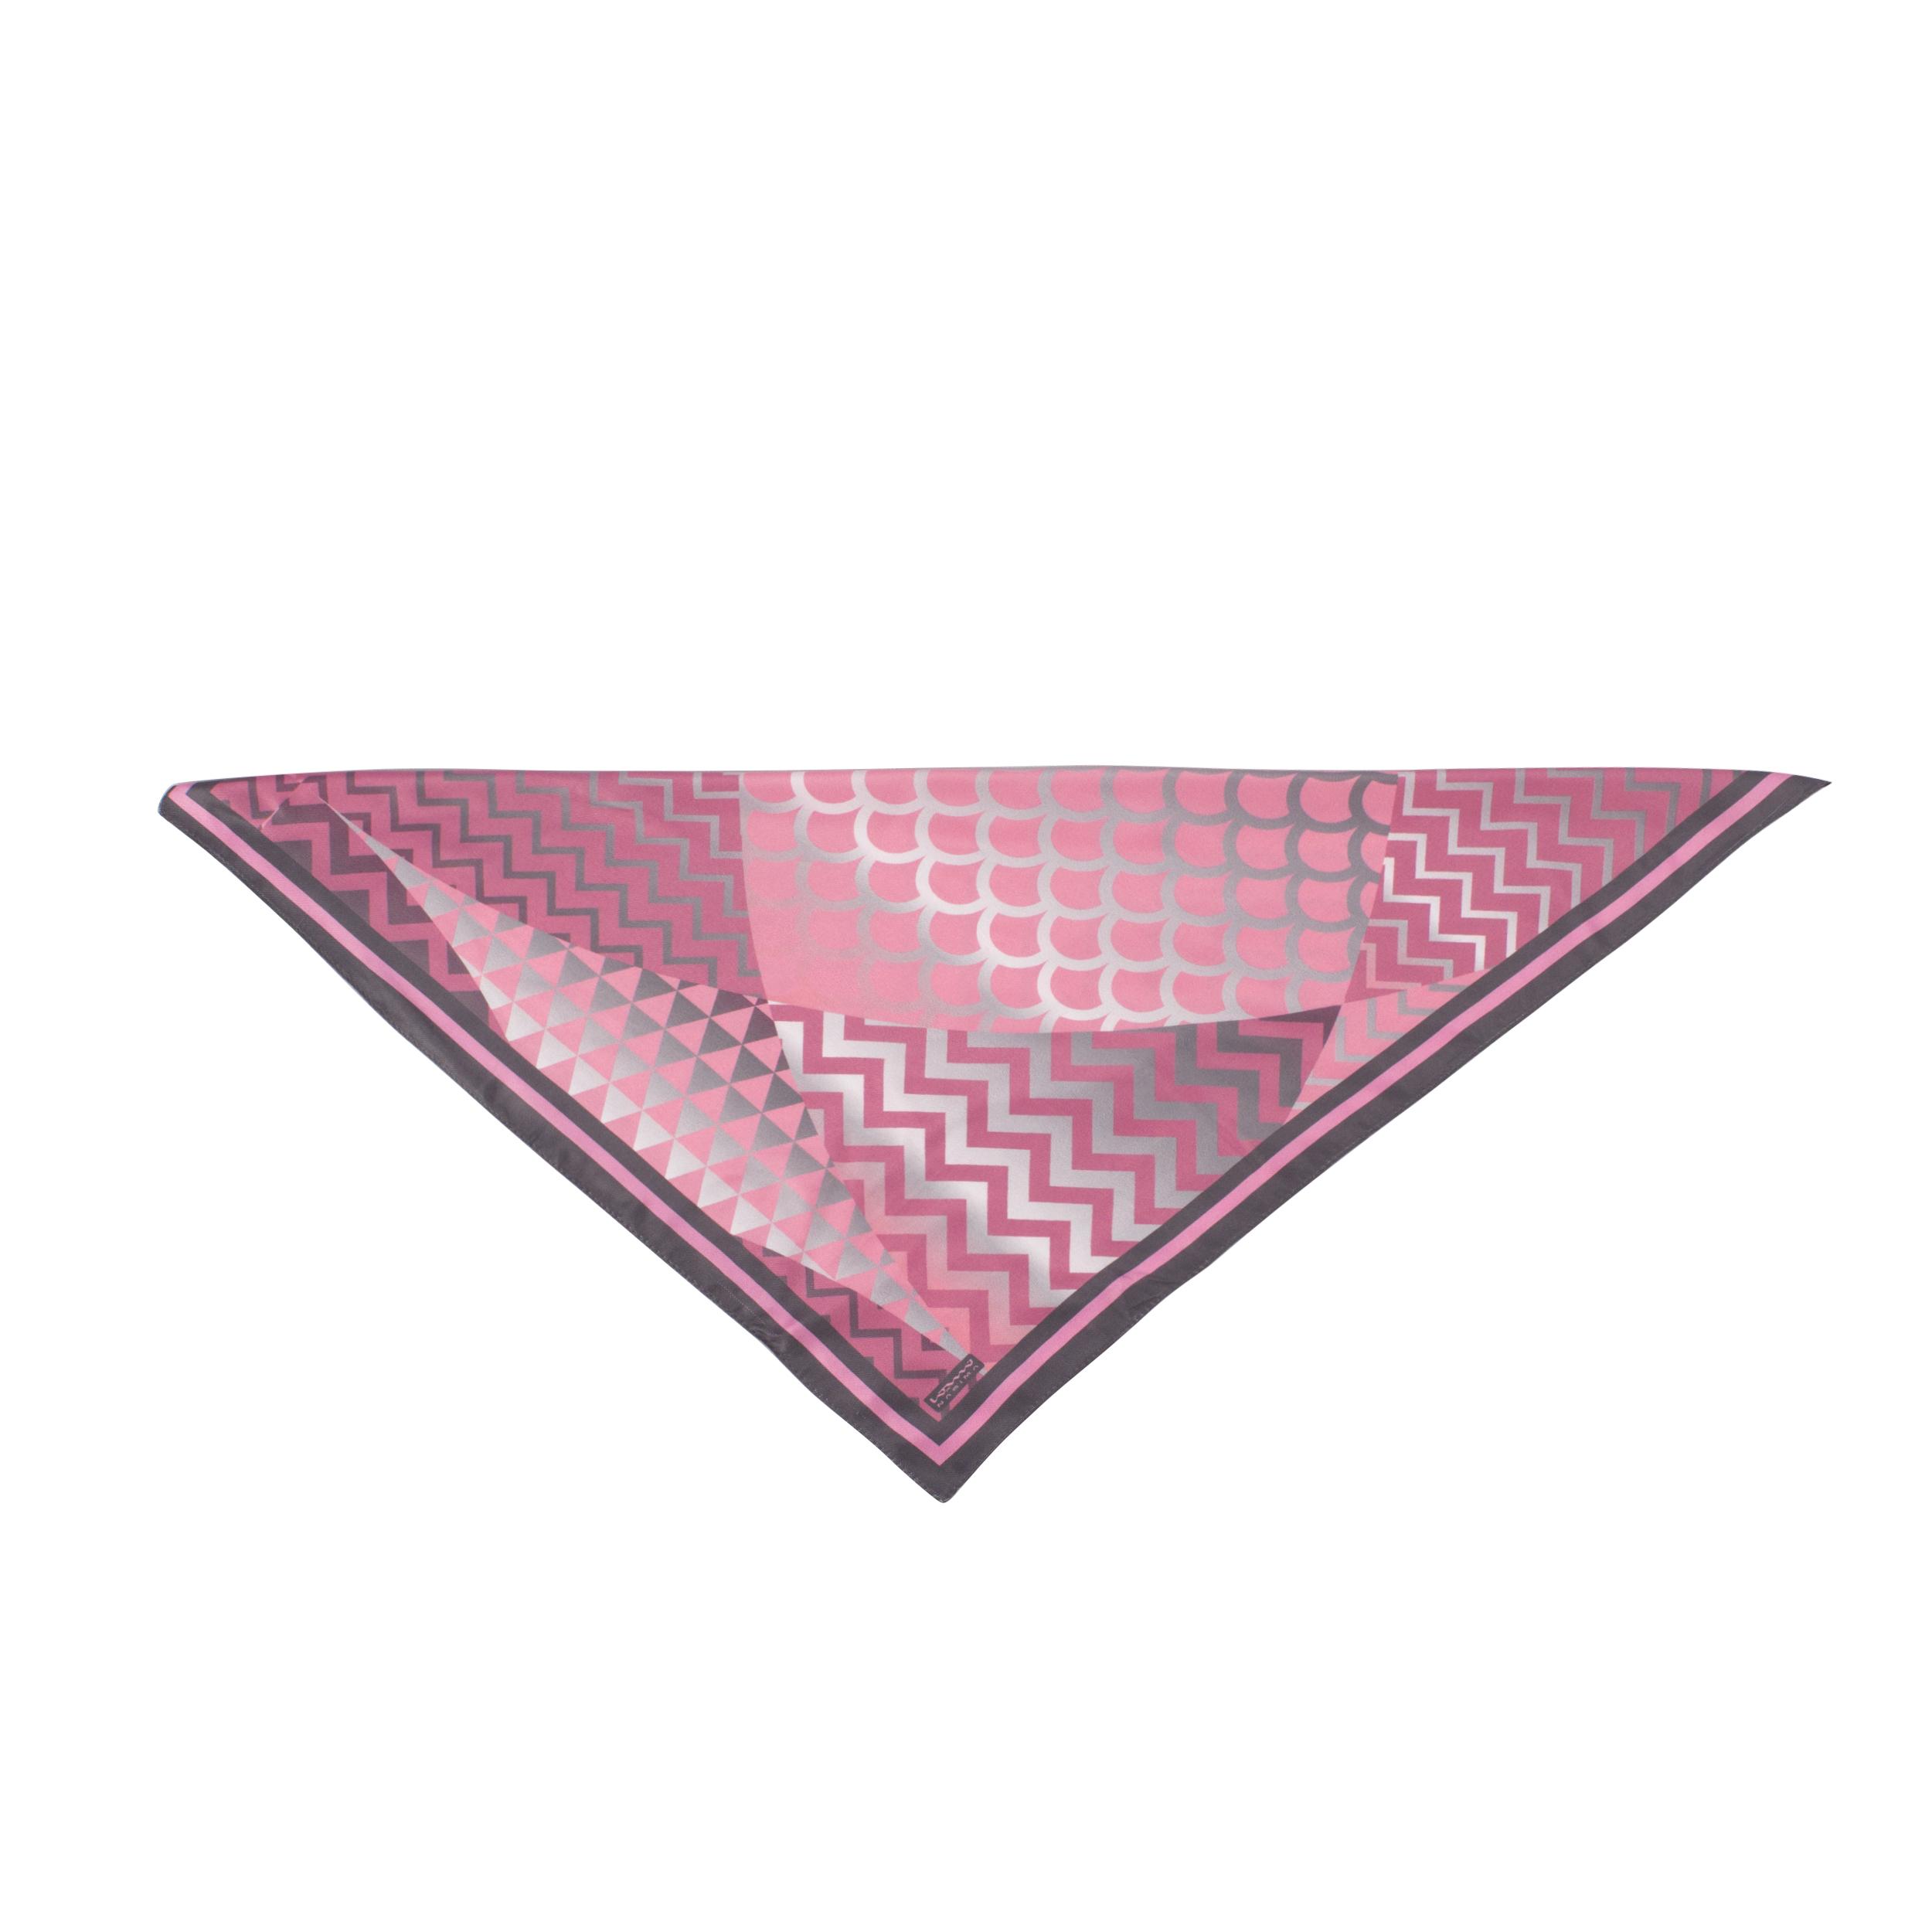 دستمال گردن زنانه نسیما کد N 118